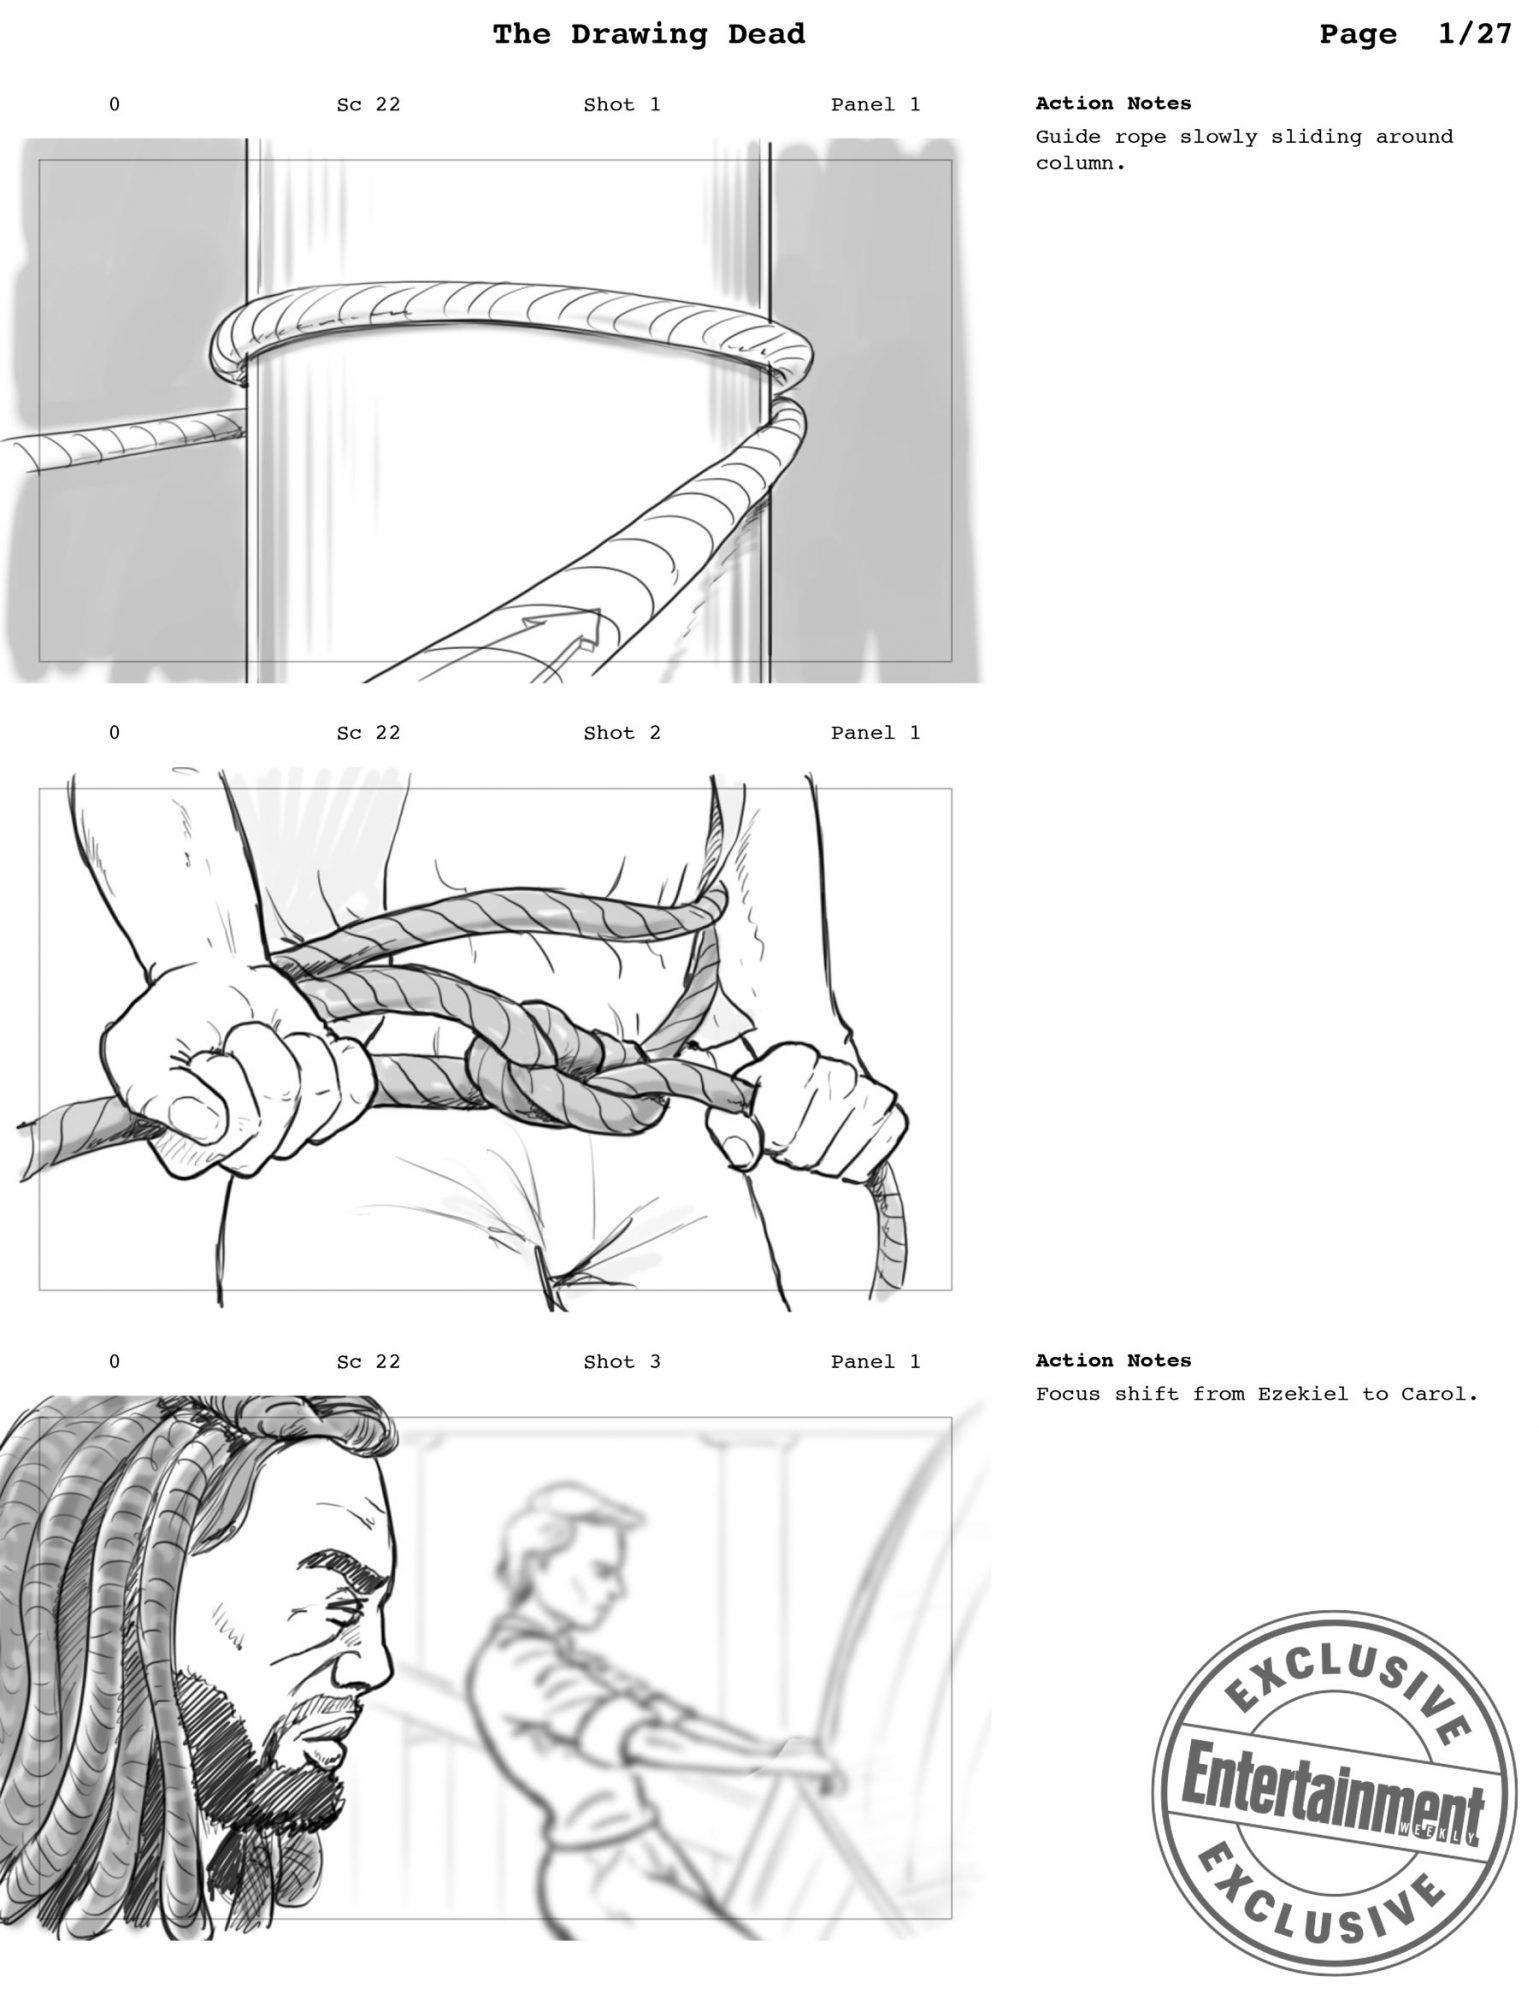 Walking Dead Storyboards from Season 9, Episode 1 Director Greg Nicotero